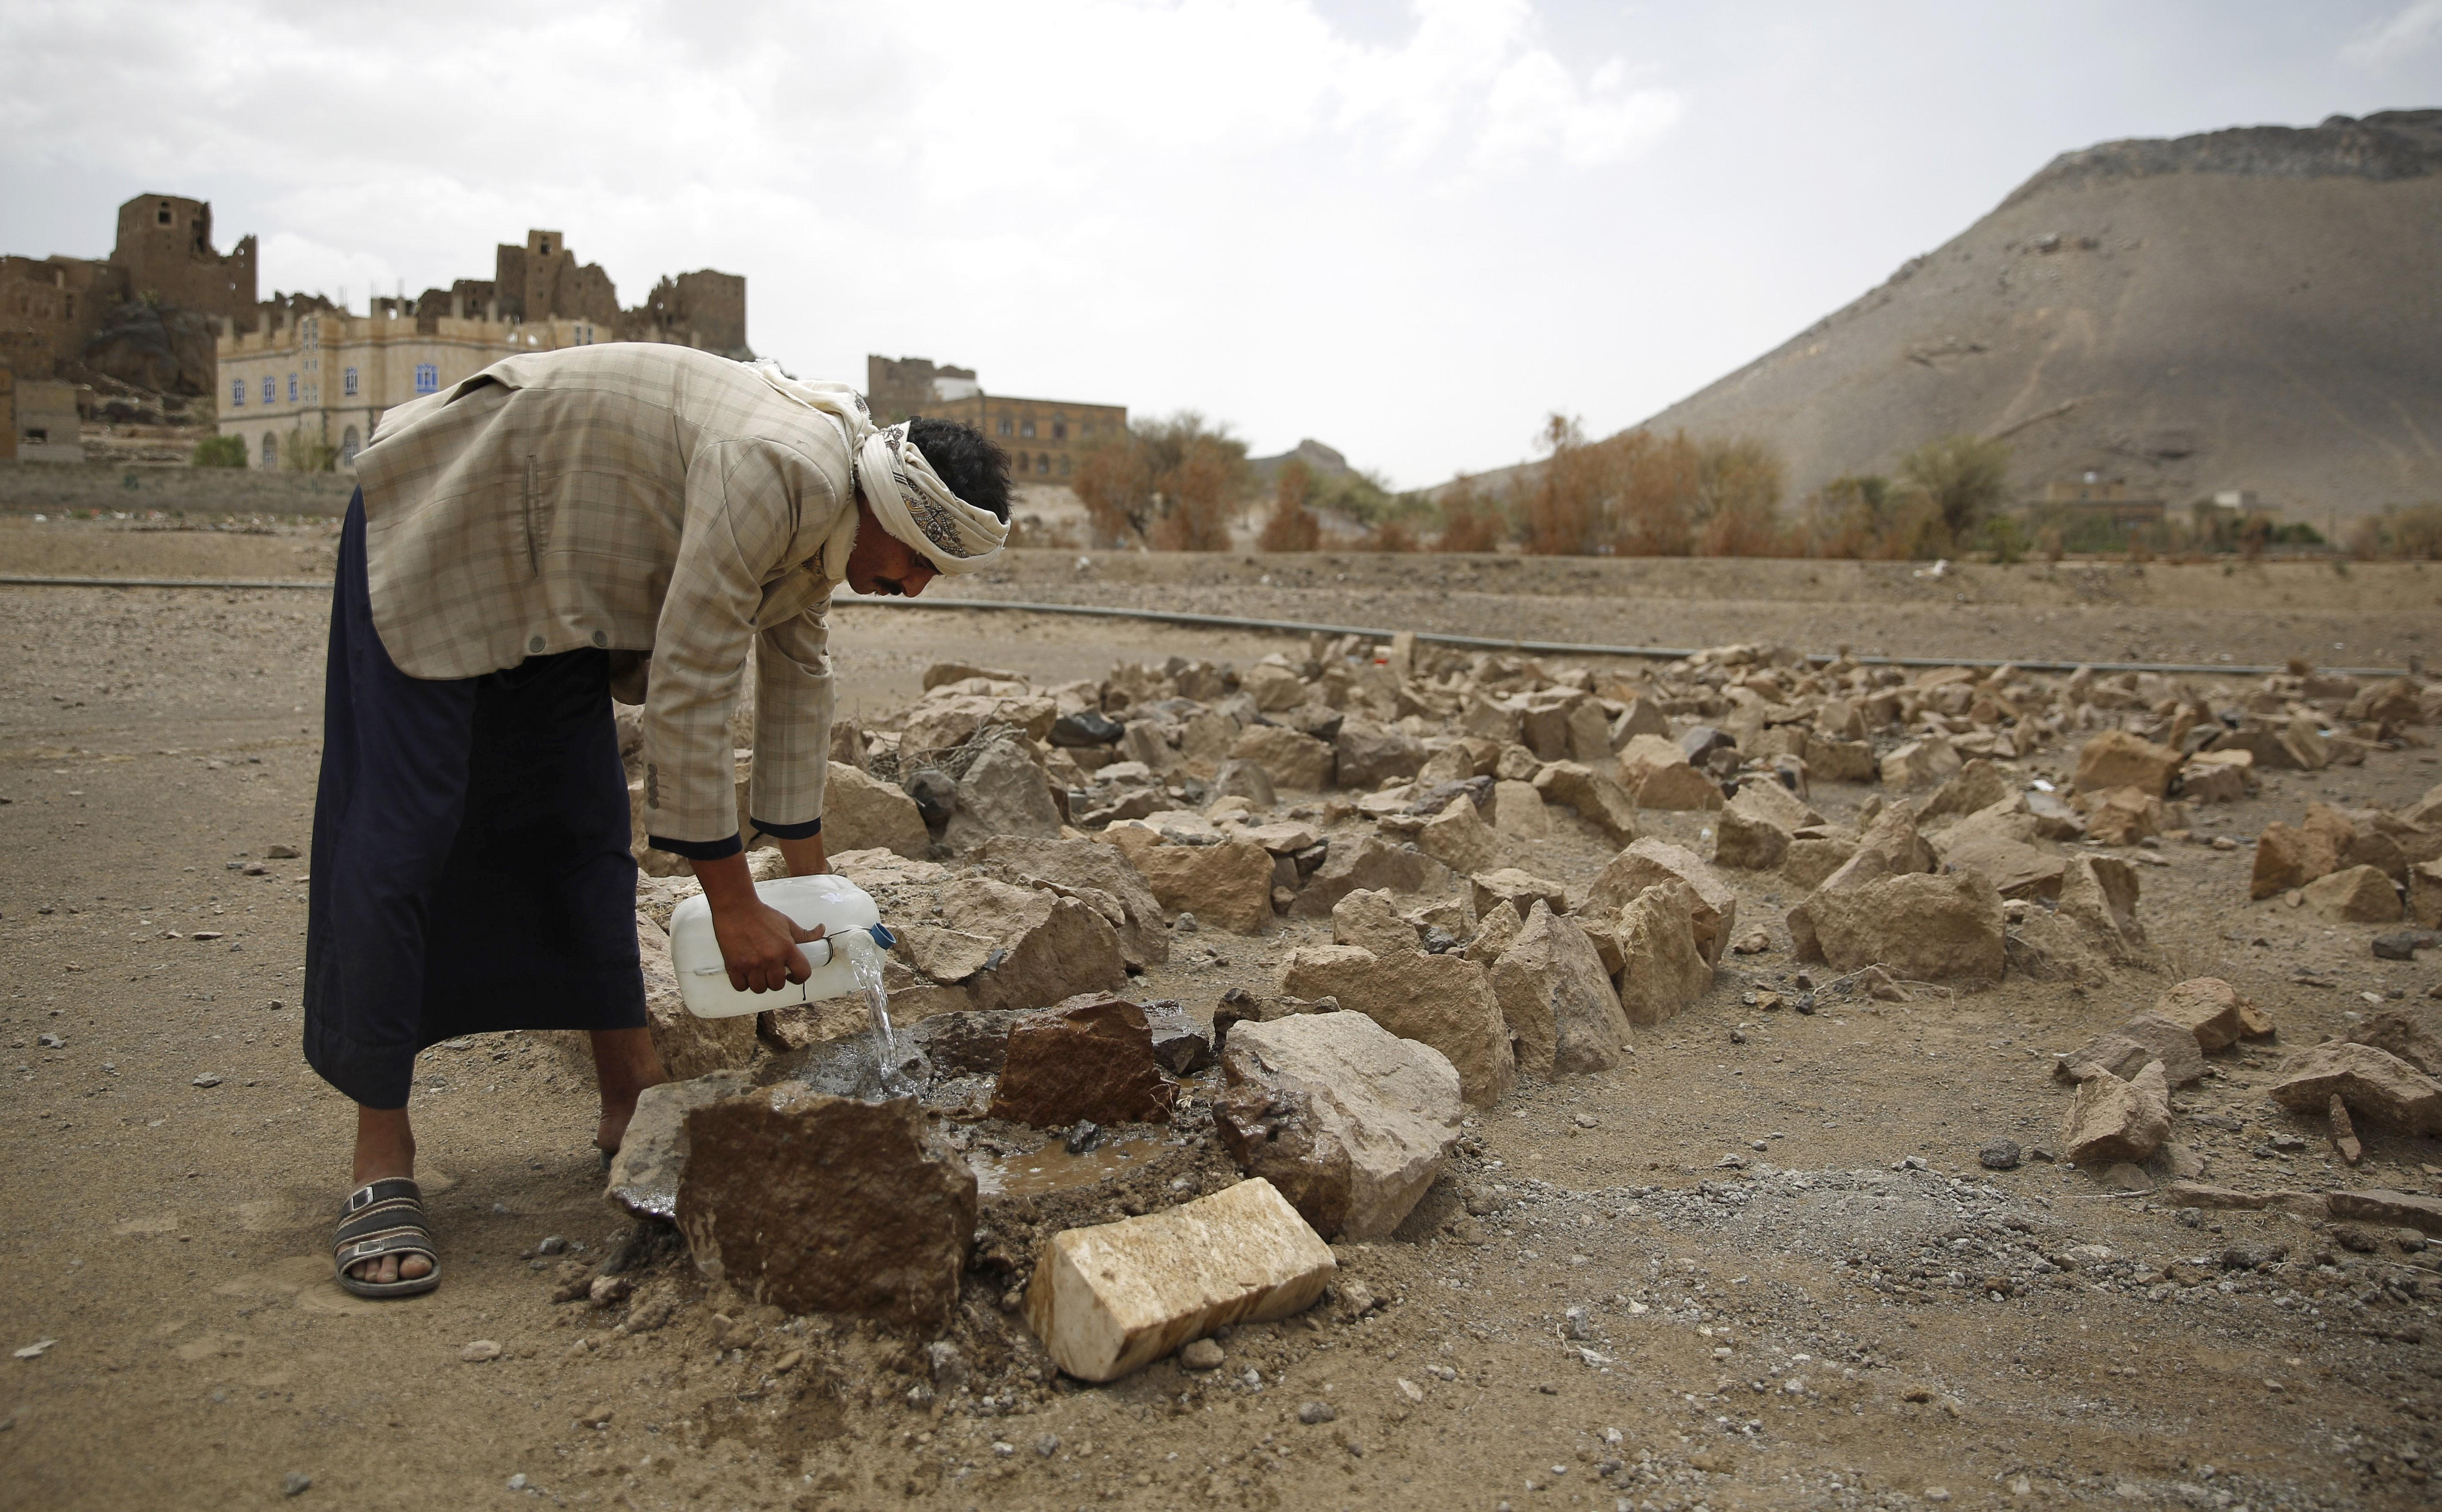 O pai de Udai rega sua sepultura, marcada apenas por pedras (Foto: AP Photo/Maad al-Zikry)